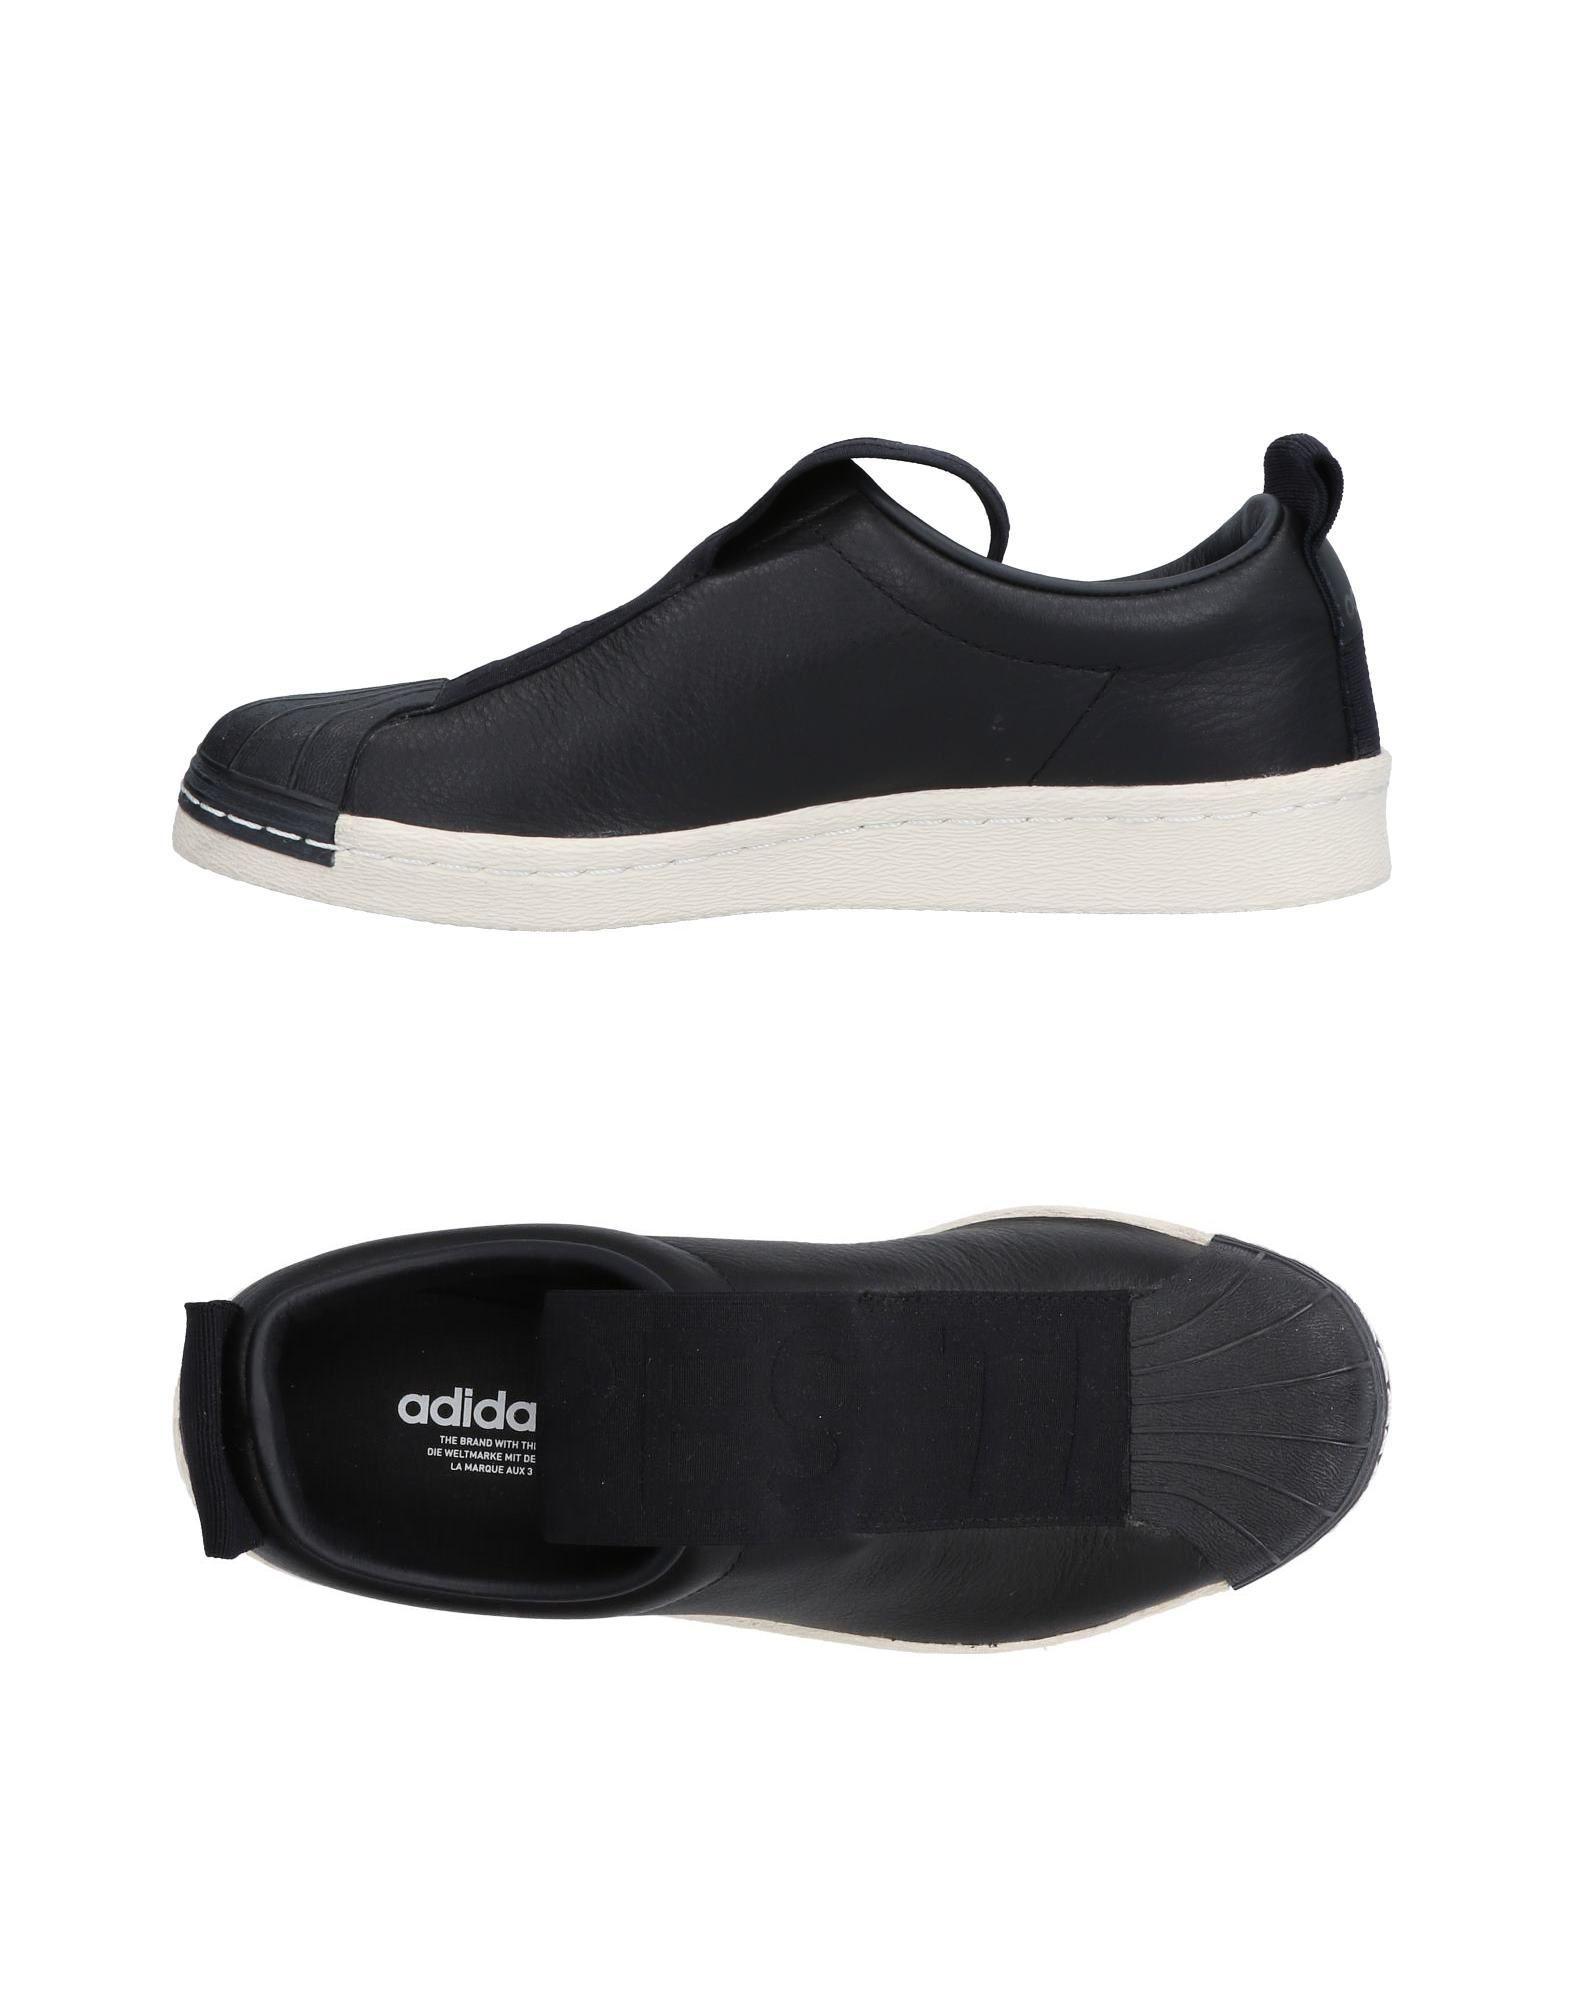 Sneakers Adidas Originals Donna - 11491064AW